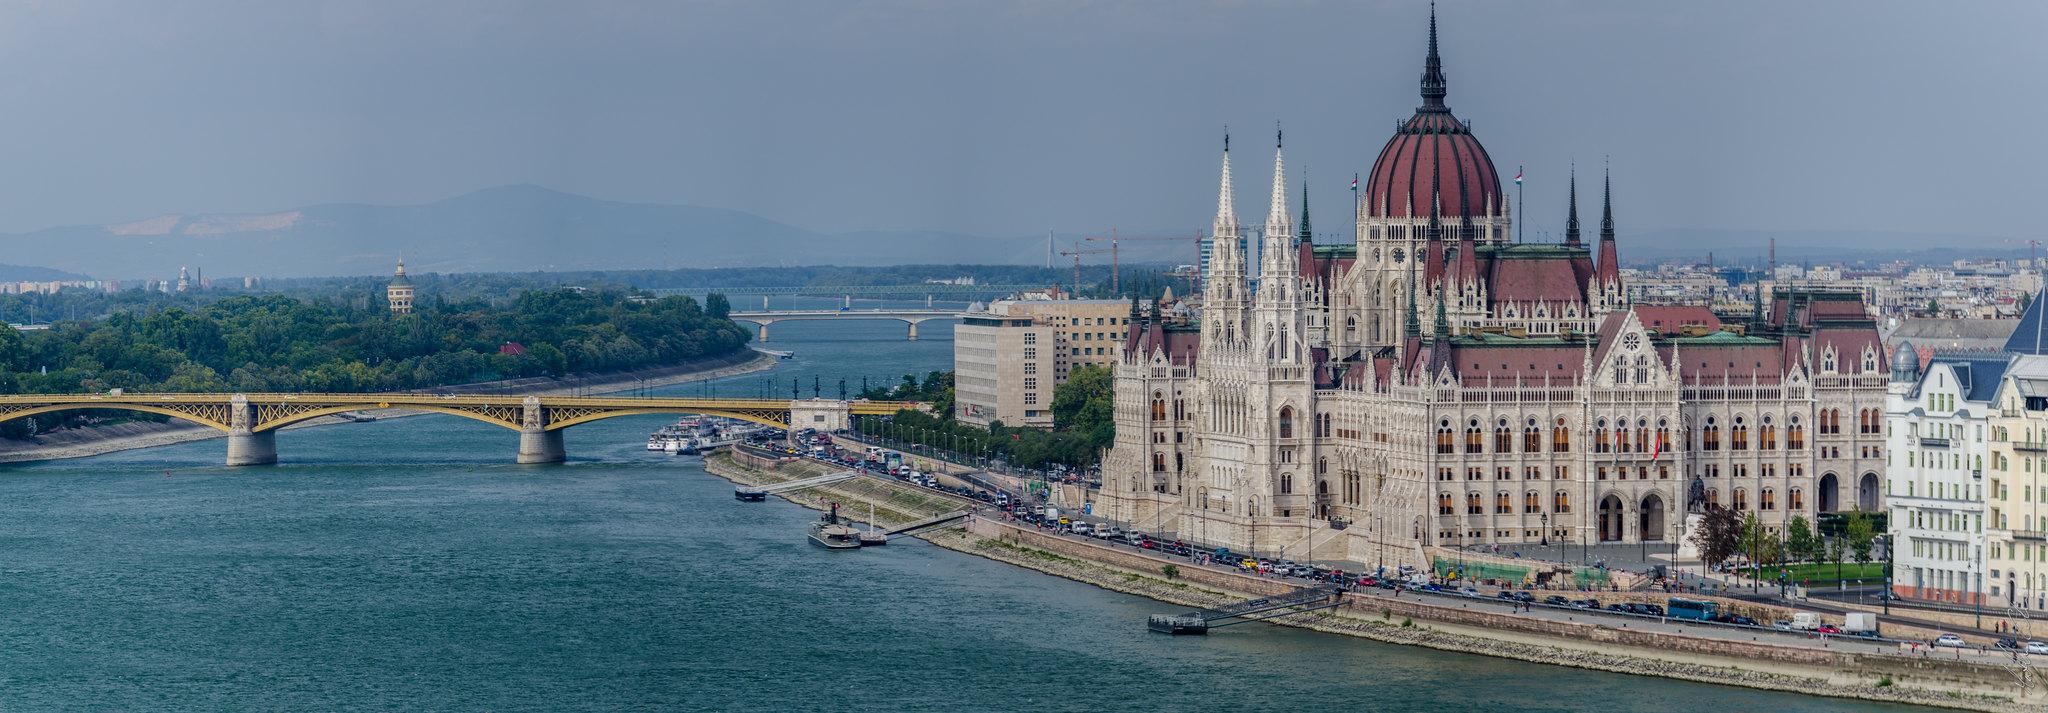 PragueVienneBudapest-Flickr-23